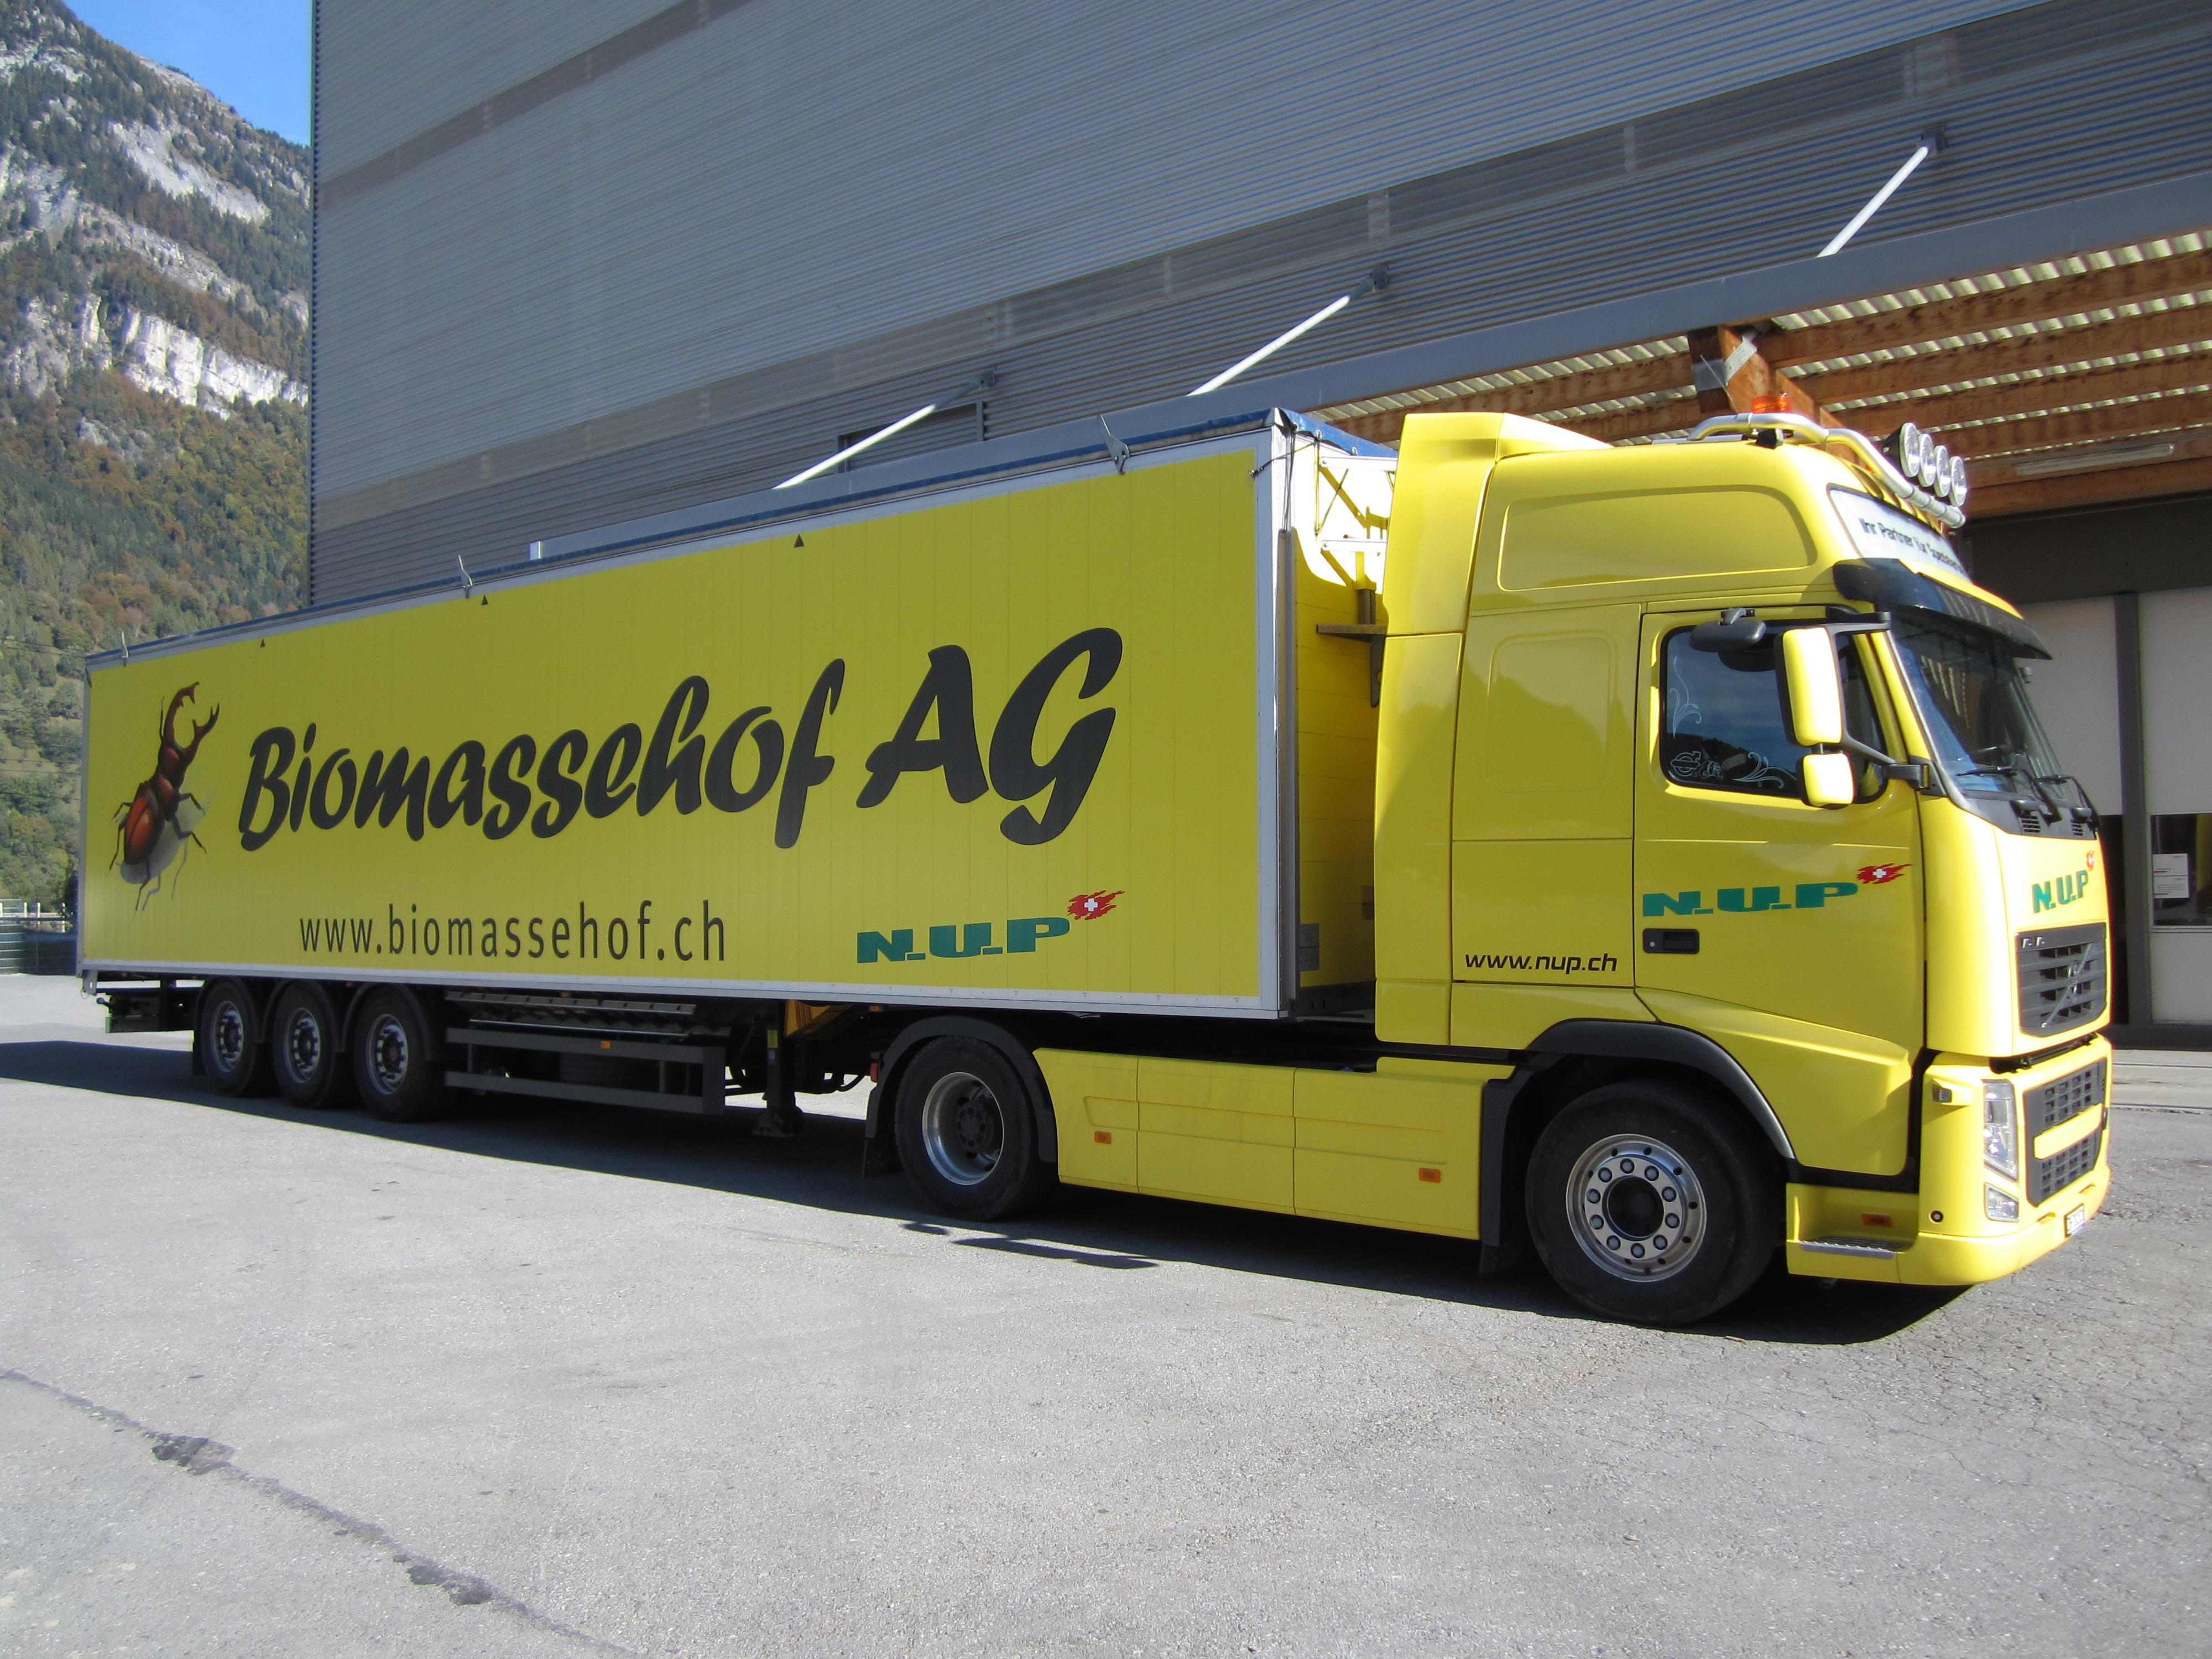 Biomassehof